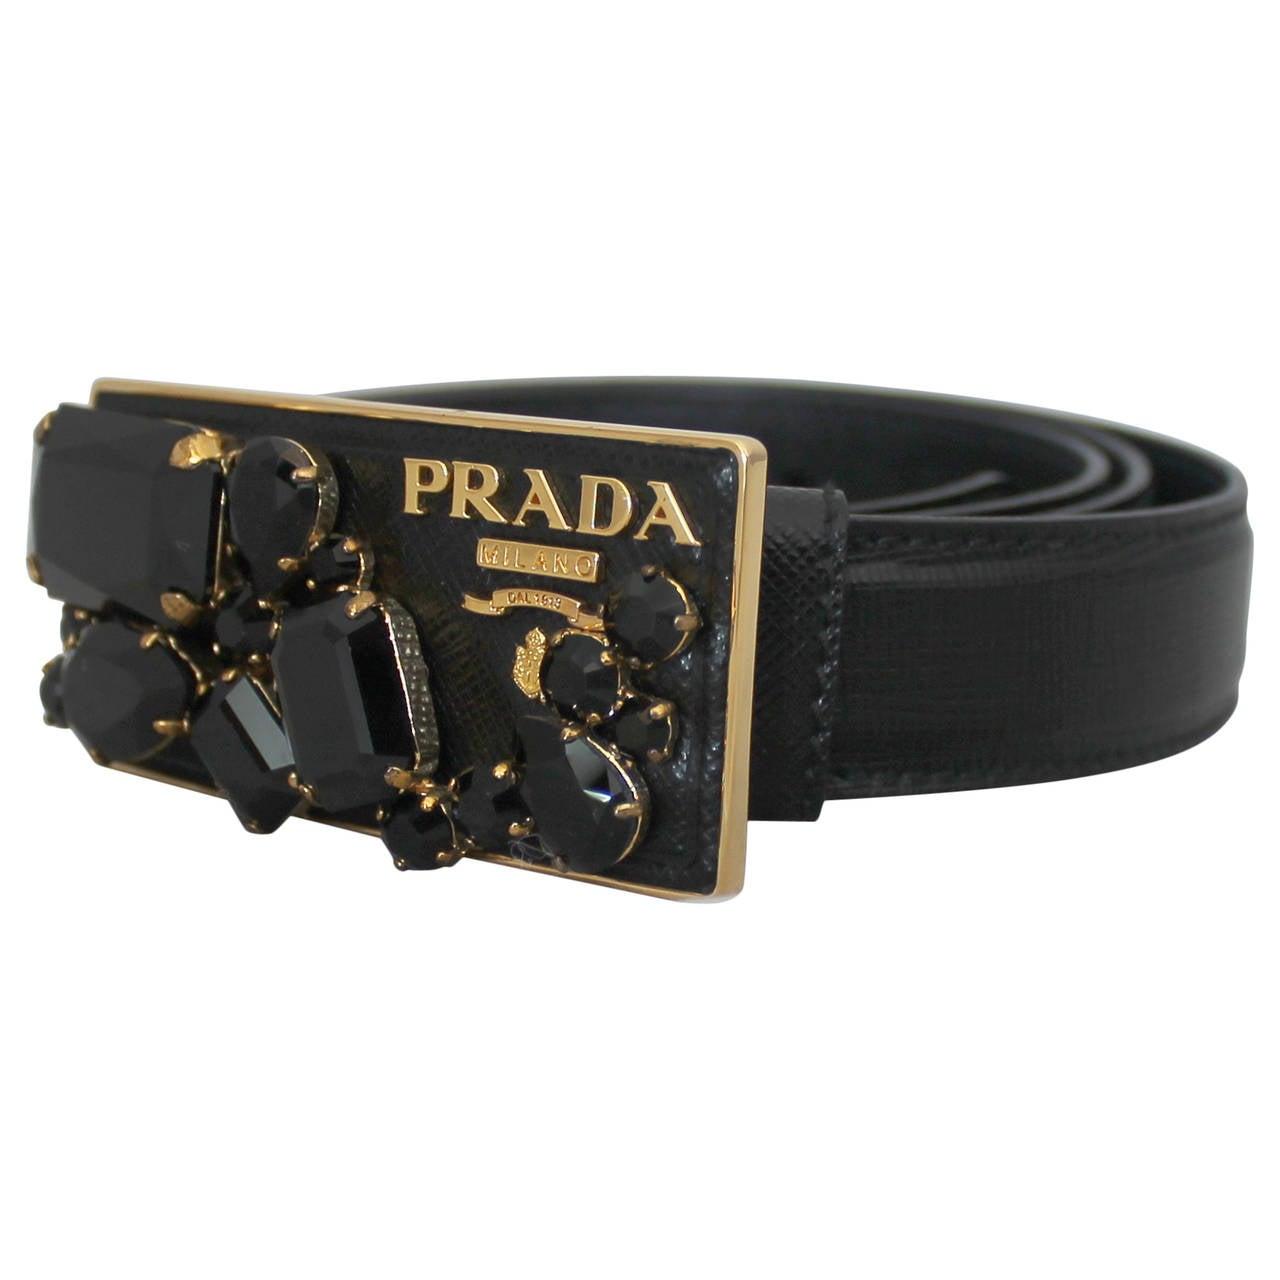 prada tan leather handbag - Prada Black Saffiano Leather Belt with Gold Rhinestone Buckle For ...